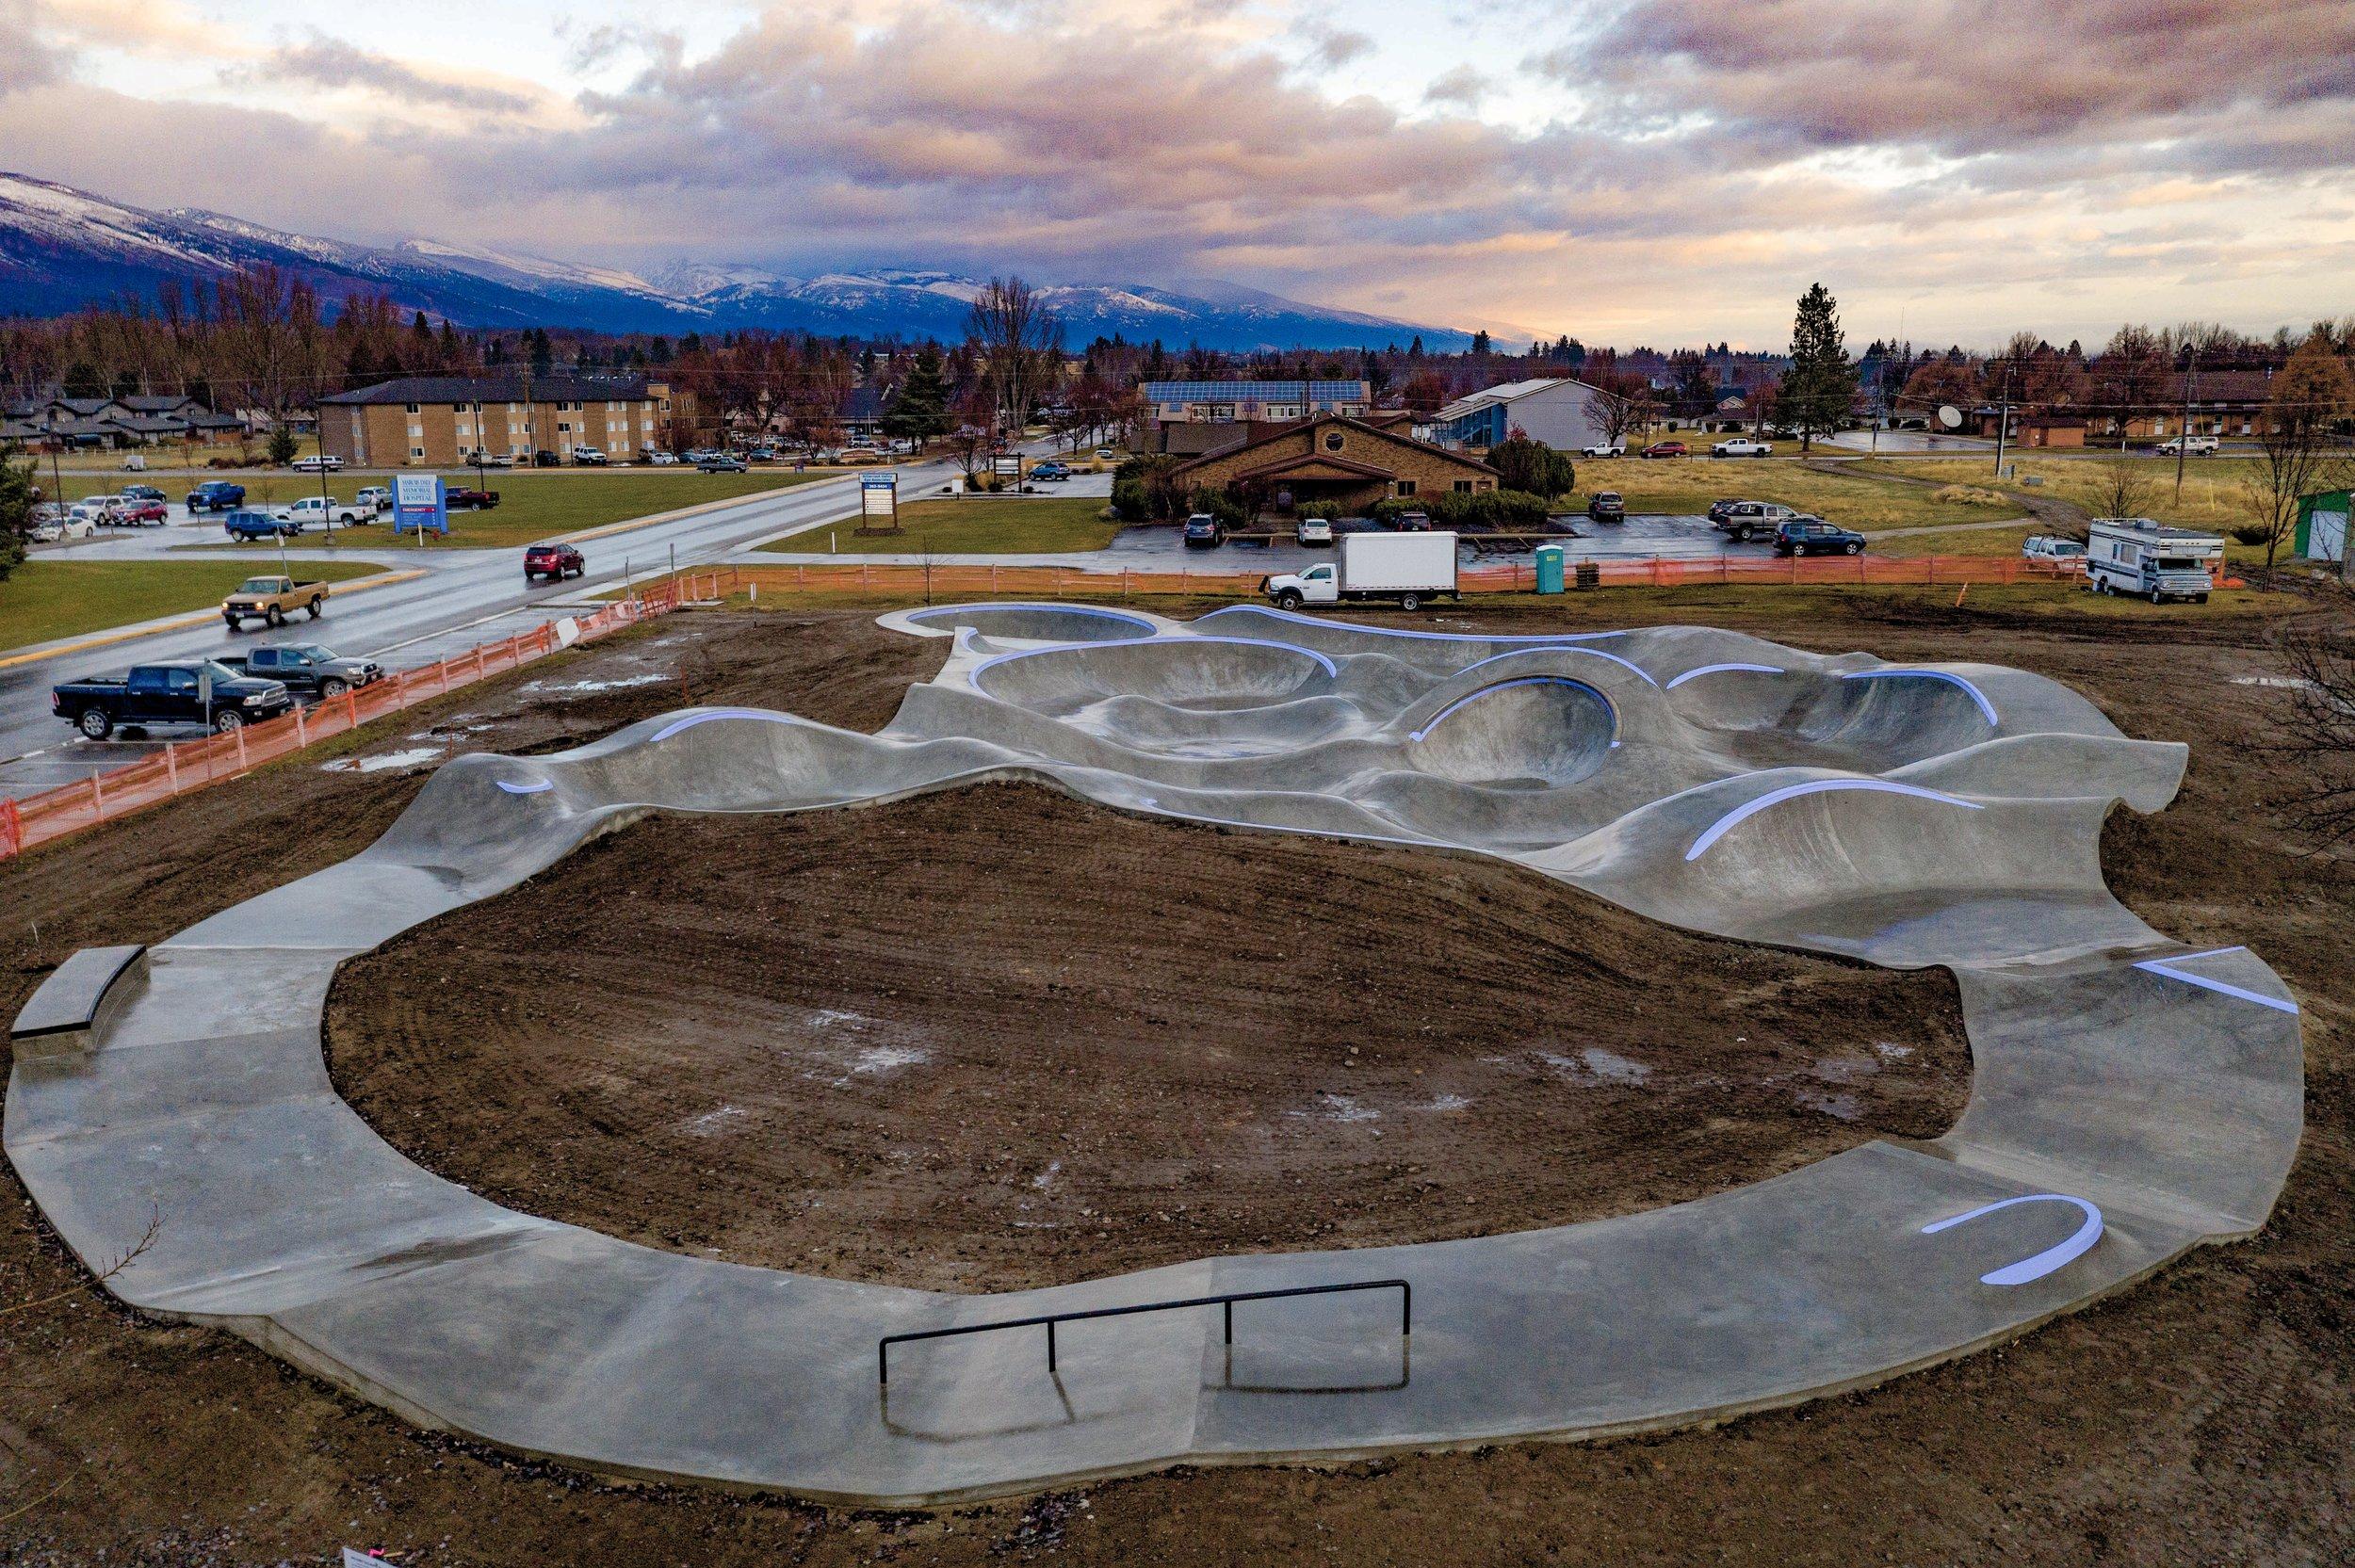 Hamilton, Montana 💯 she's a dream. The circular 'sprack Track' keeps the momentum going ↔️